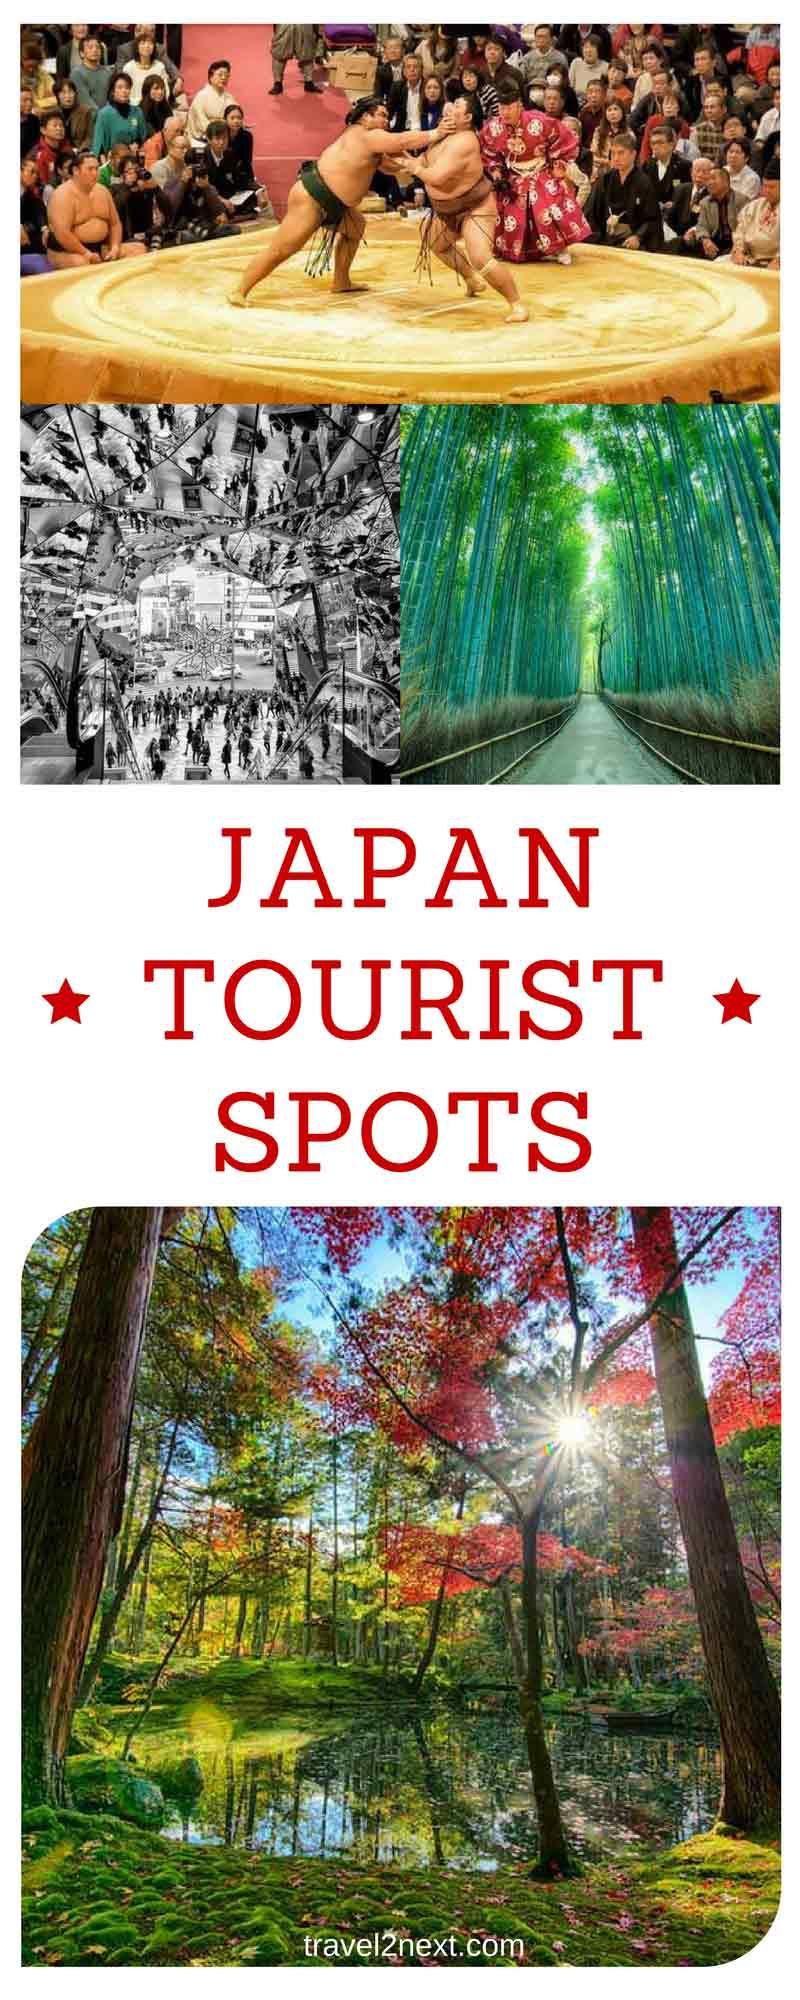 Tourism Japan Australia